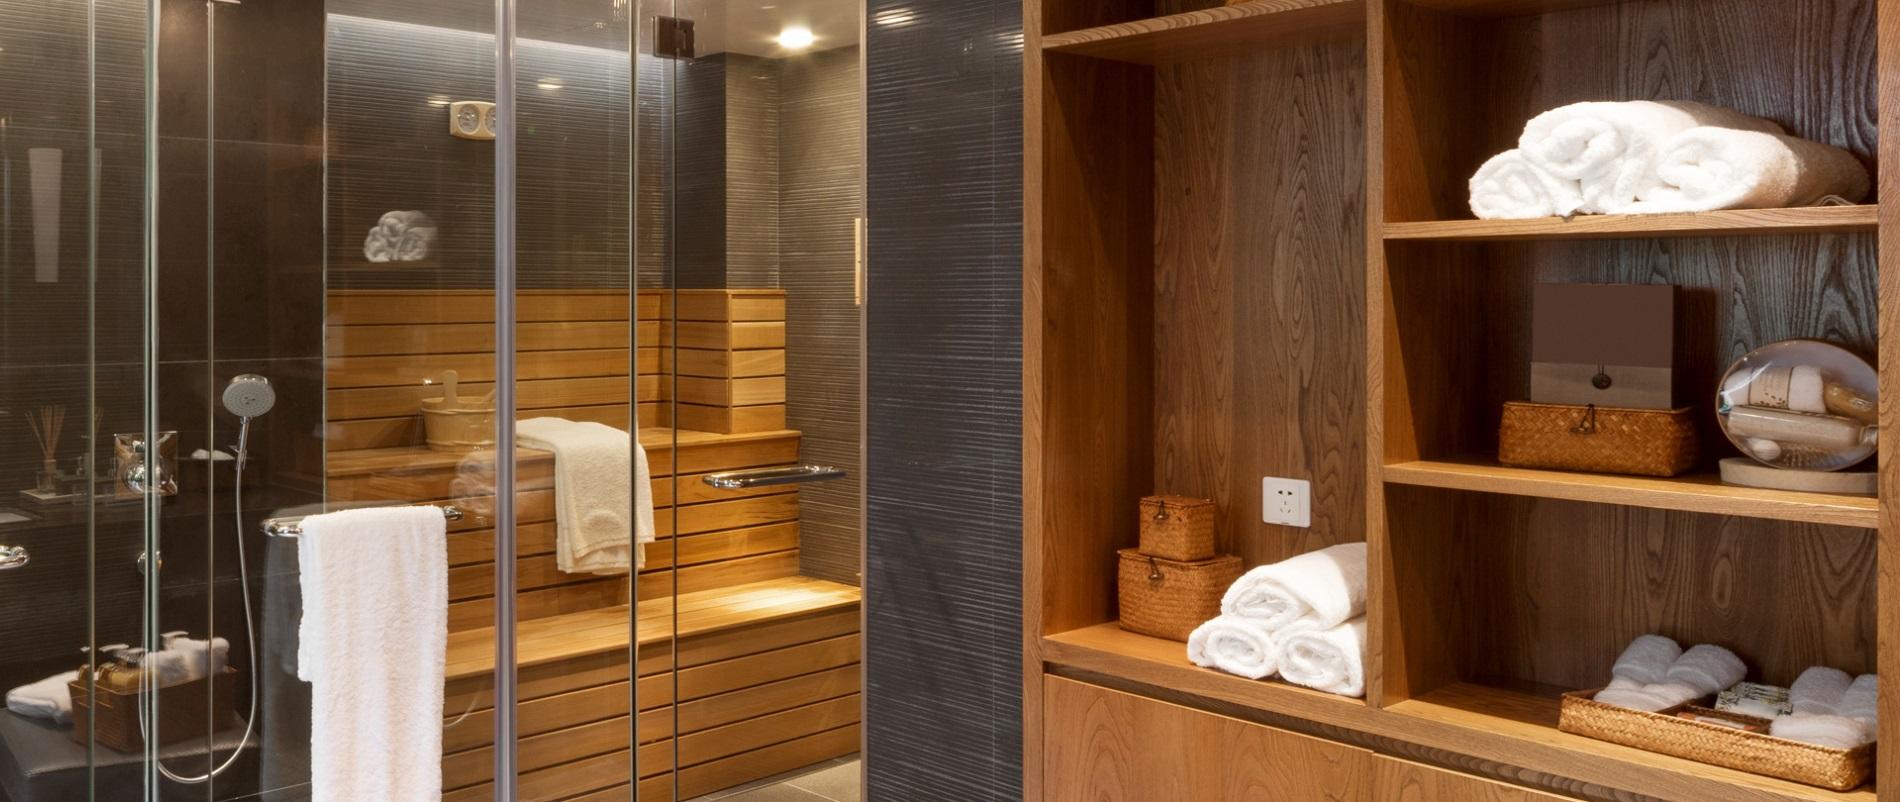 Badezimmer als Ruhestätte/ Wellness Oase | Möbelbau Geier ...